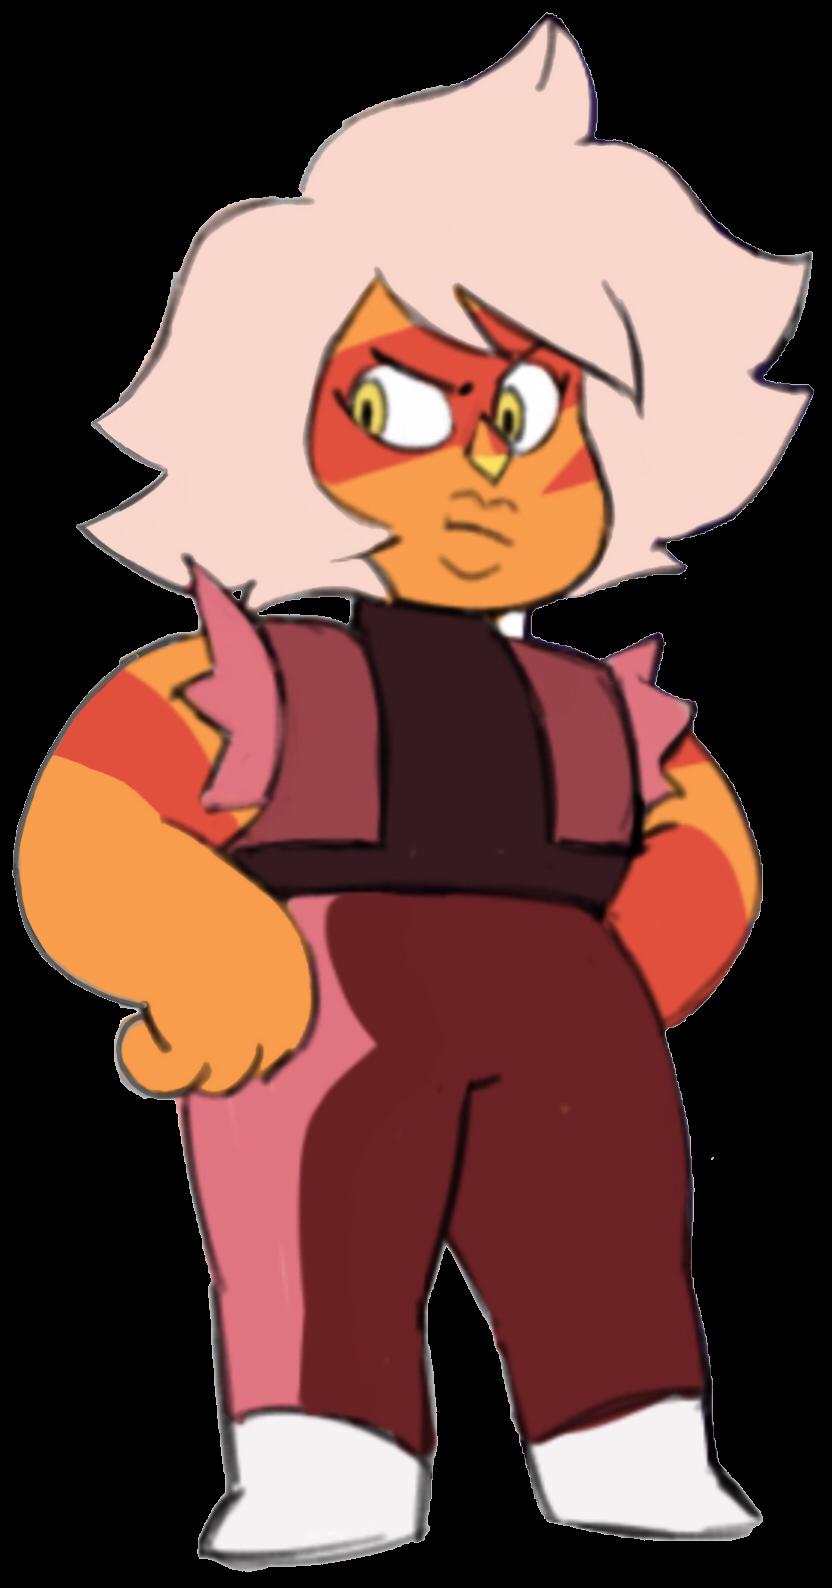 Jasper (Hypothetical)